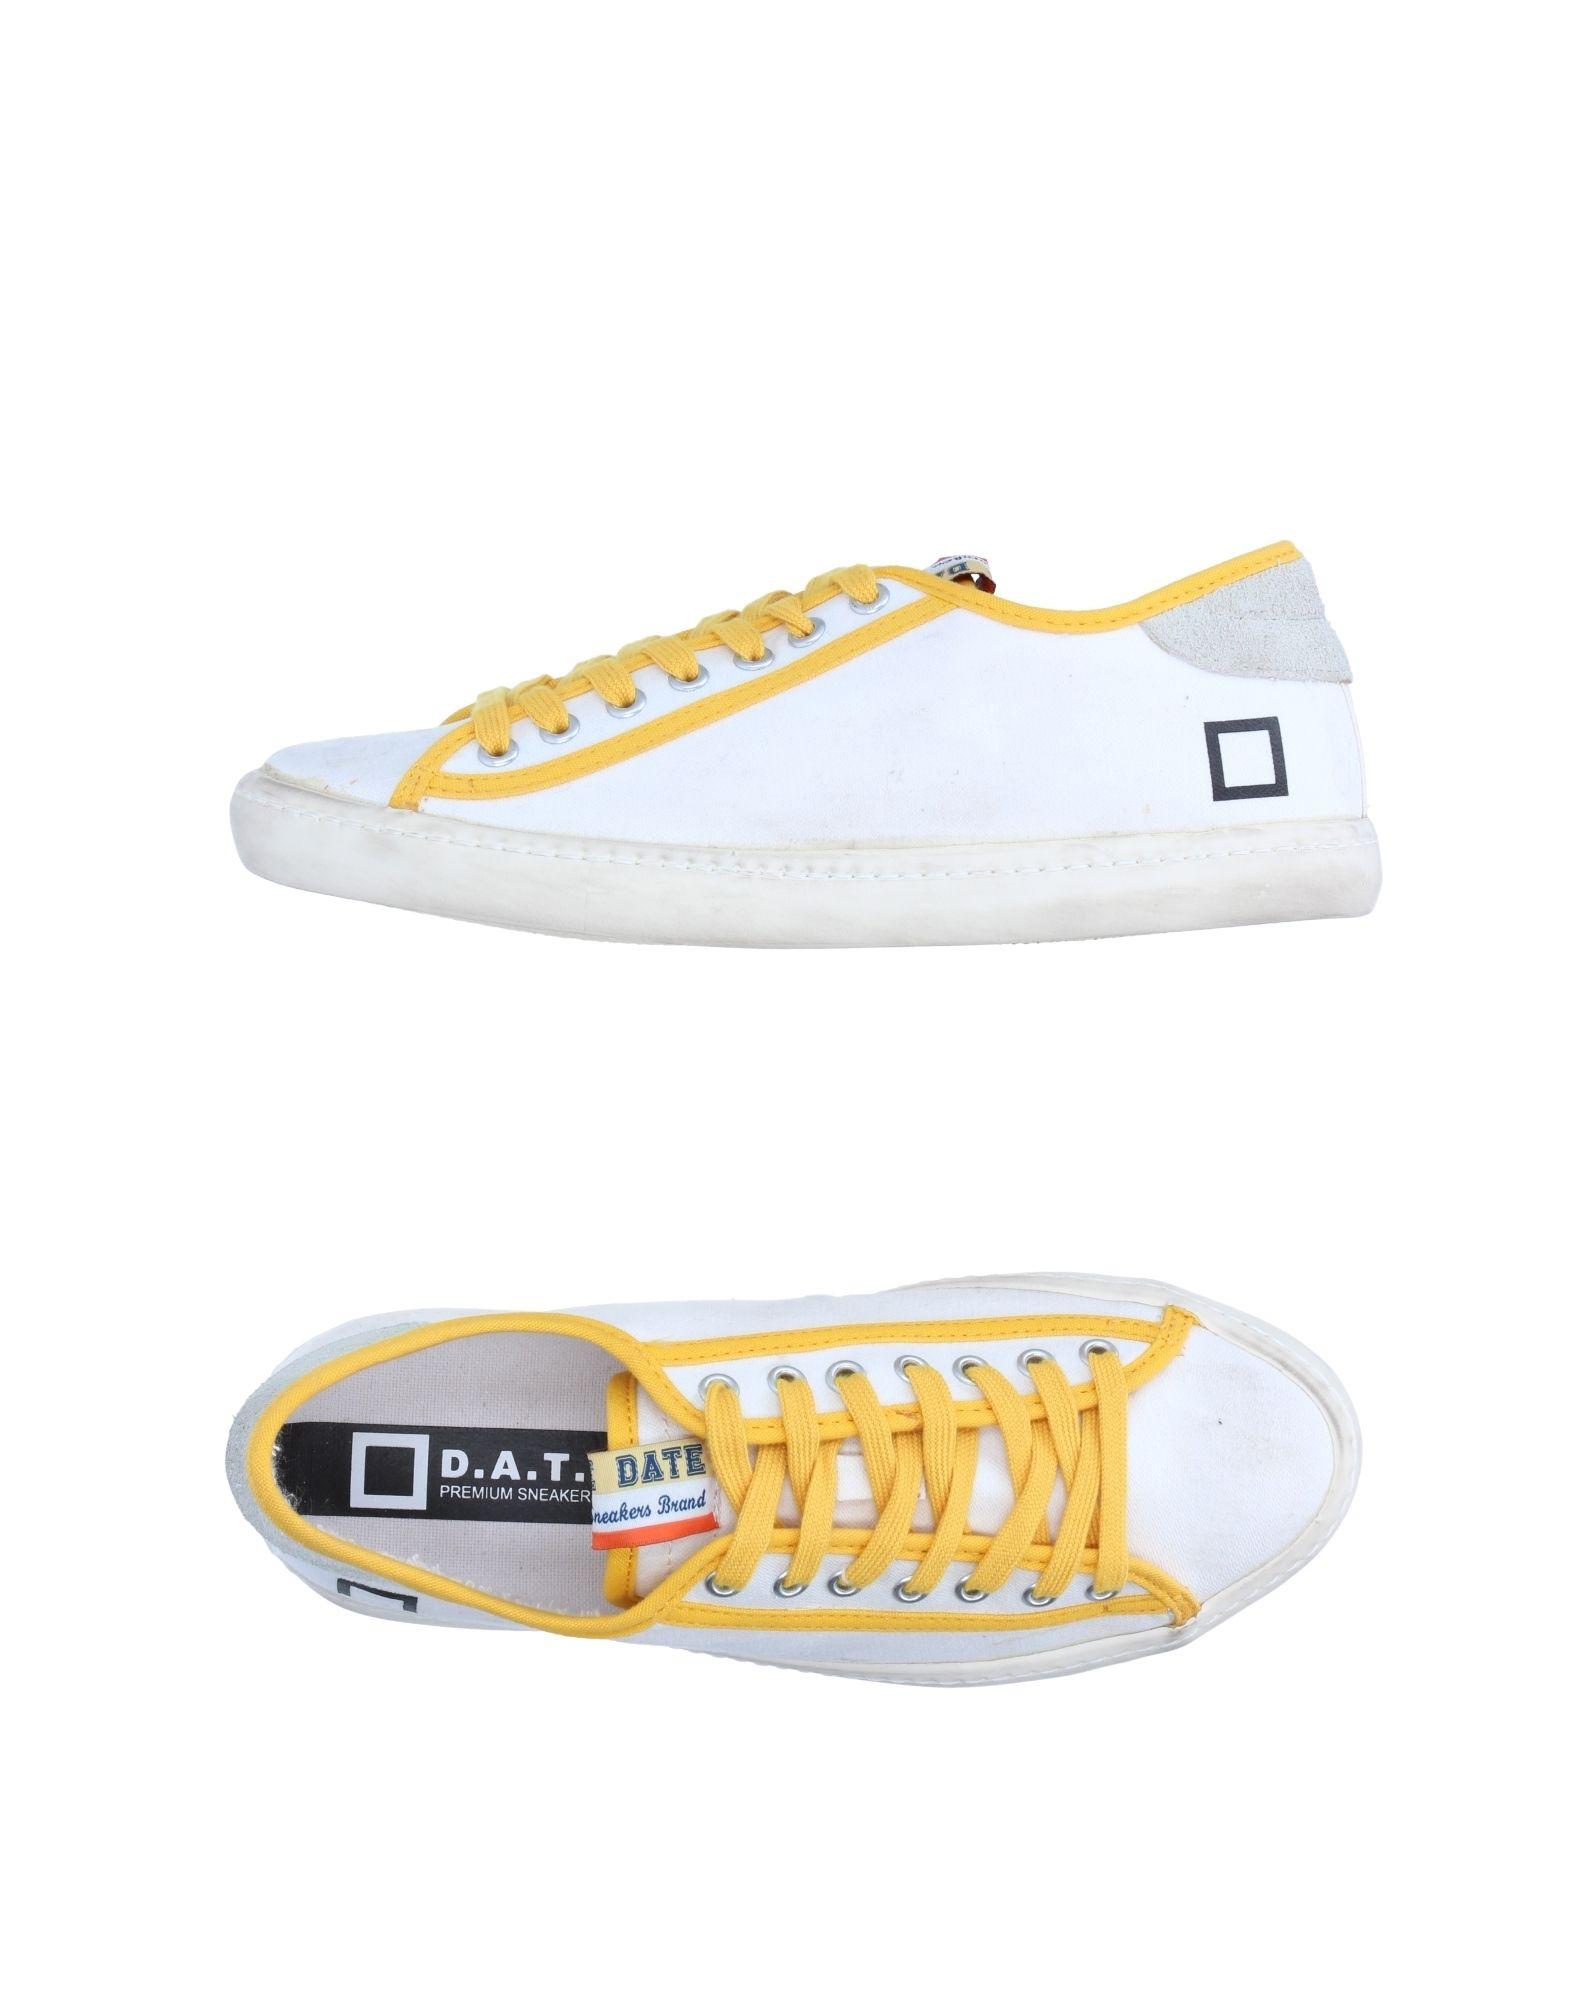 Moda Scarpe da Donna Ginnastica D.A.T.E. Donna da - 11254005FO ab47a5